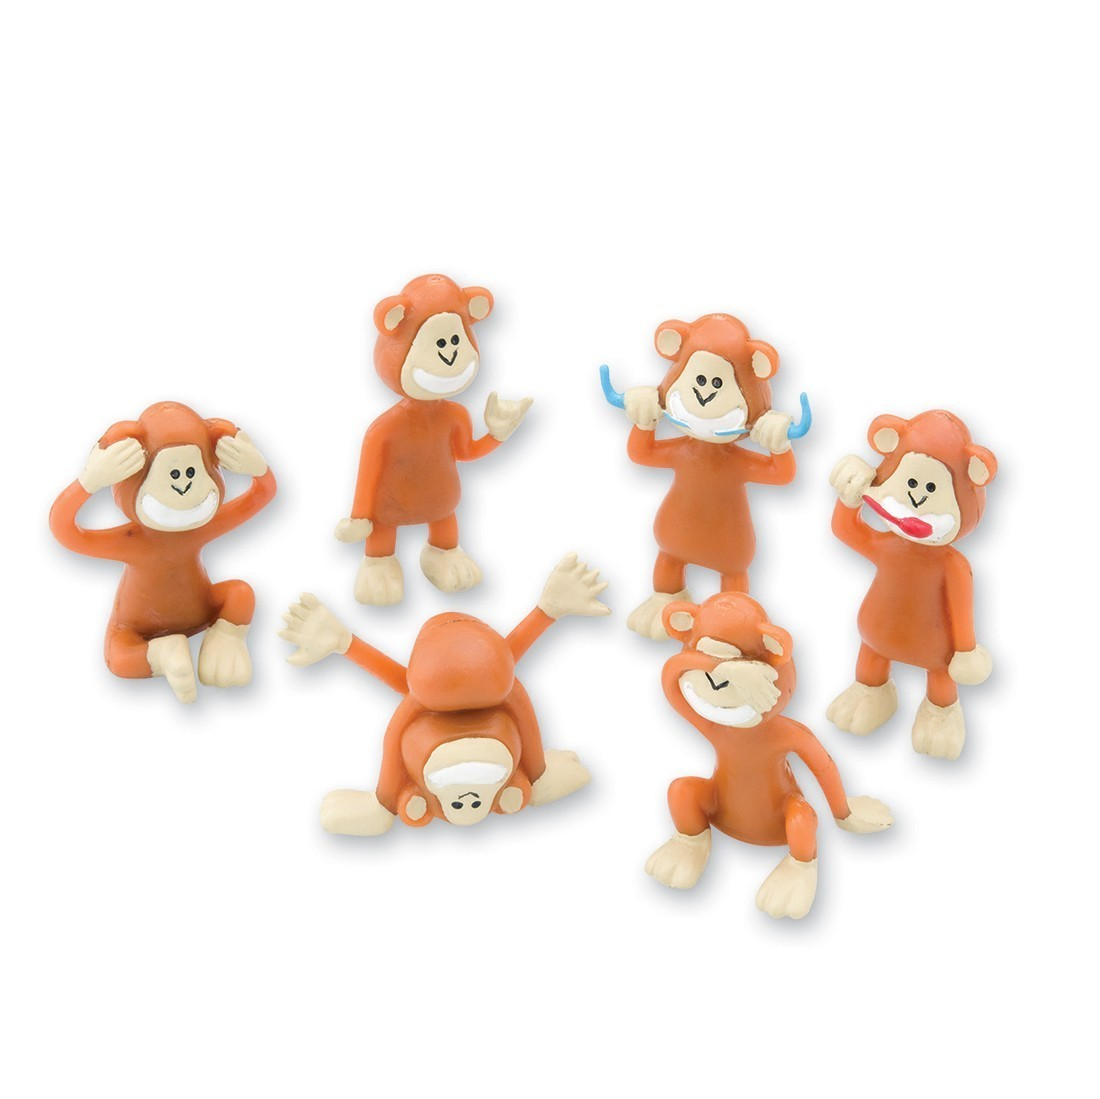 Brush, Floss, Smile Monkey Figurines [image]